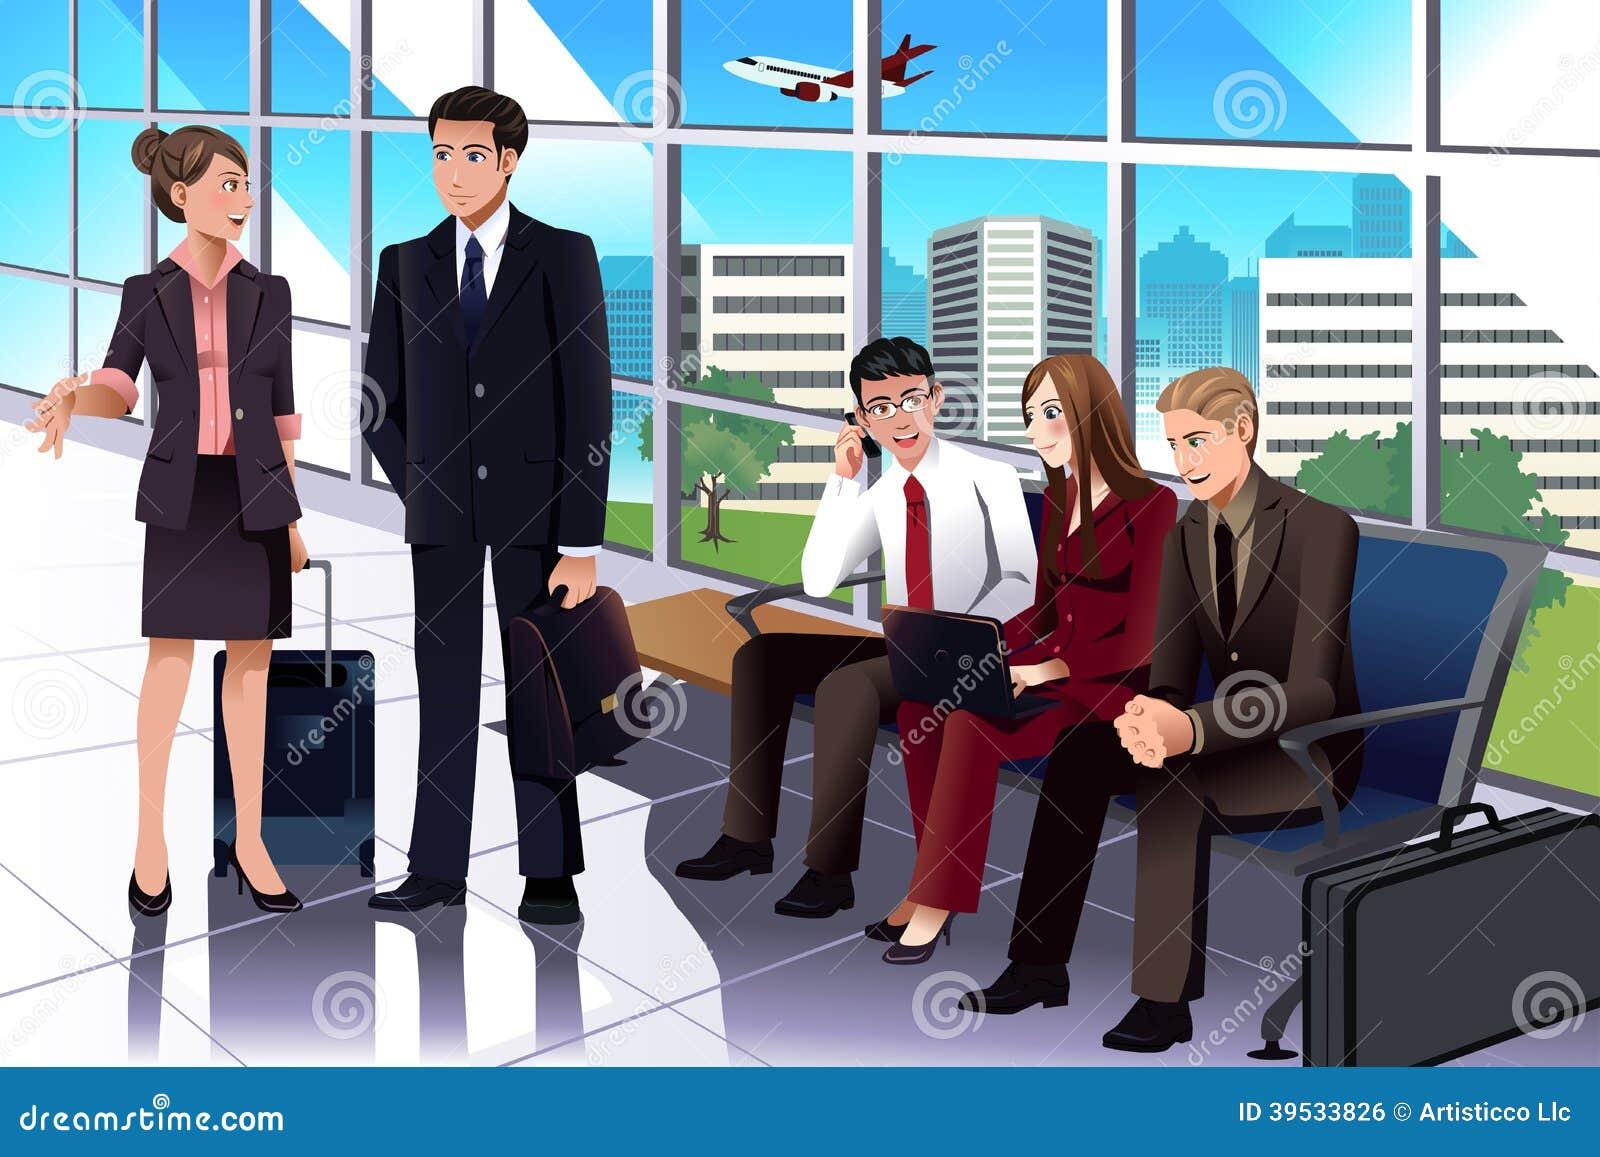 Bedrijfsmensen die in de luchthaven wachten